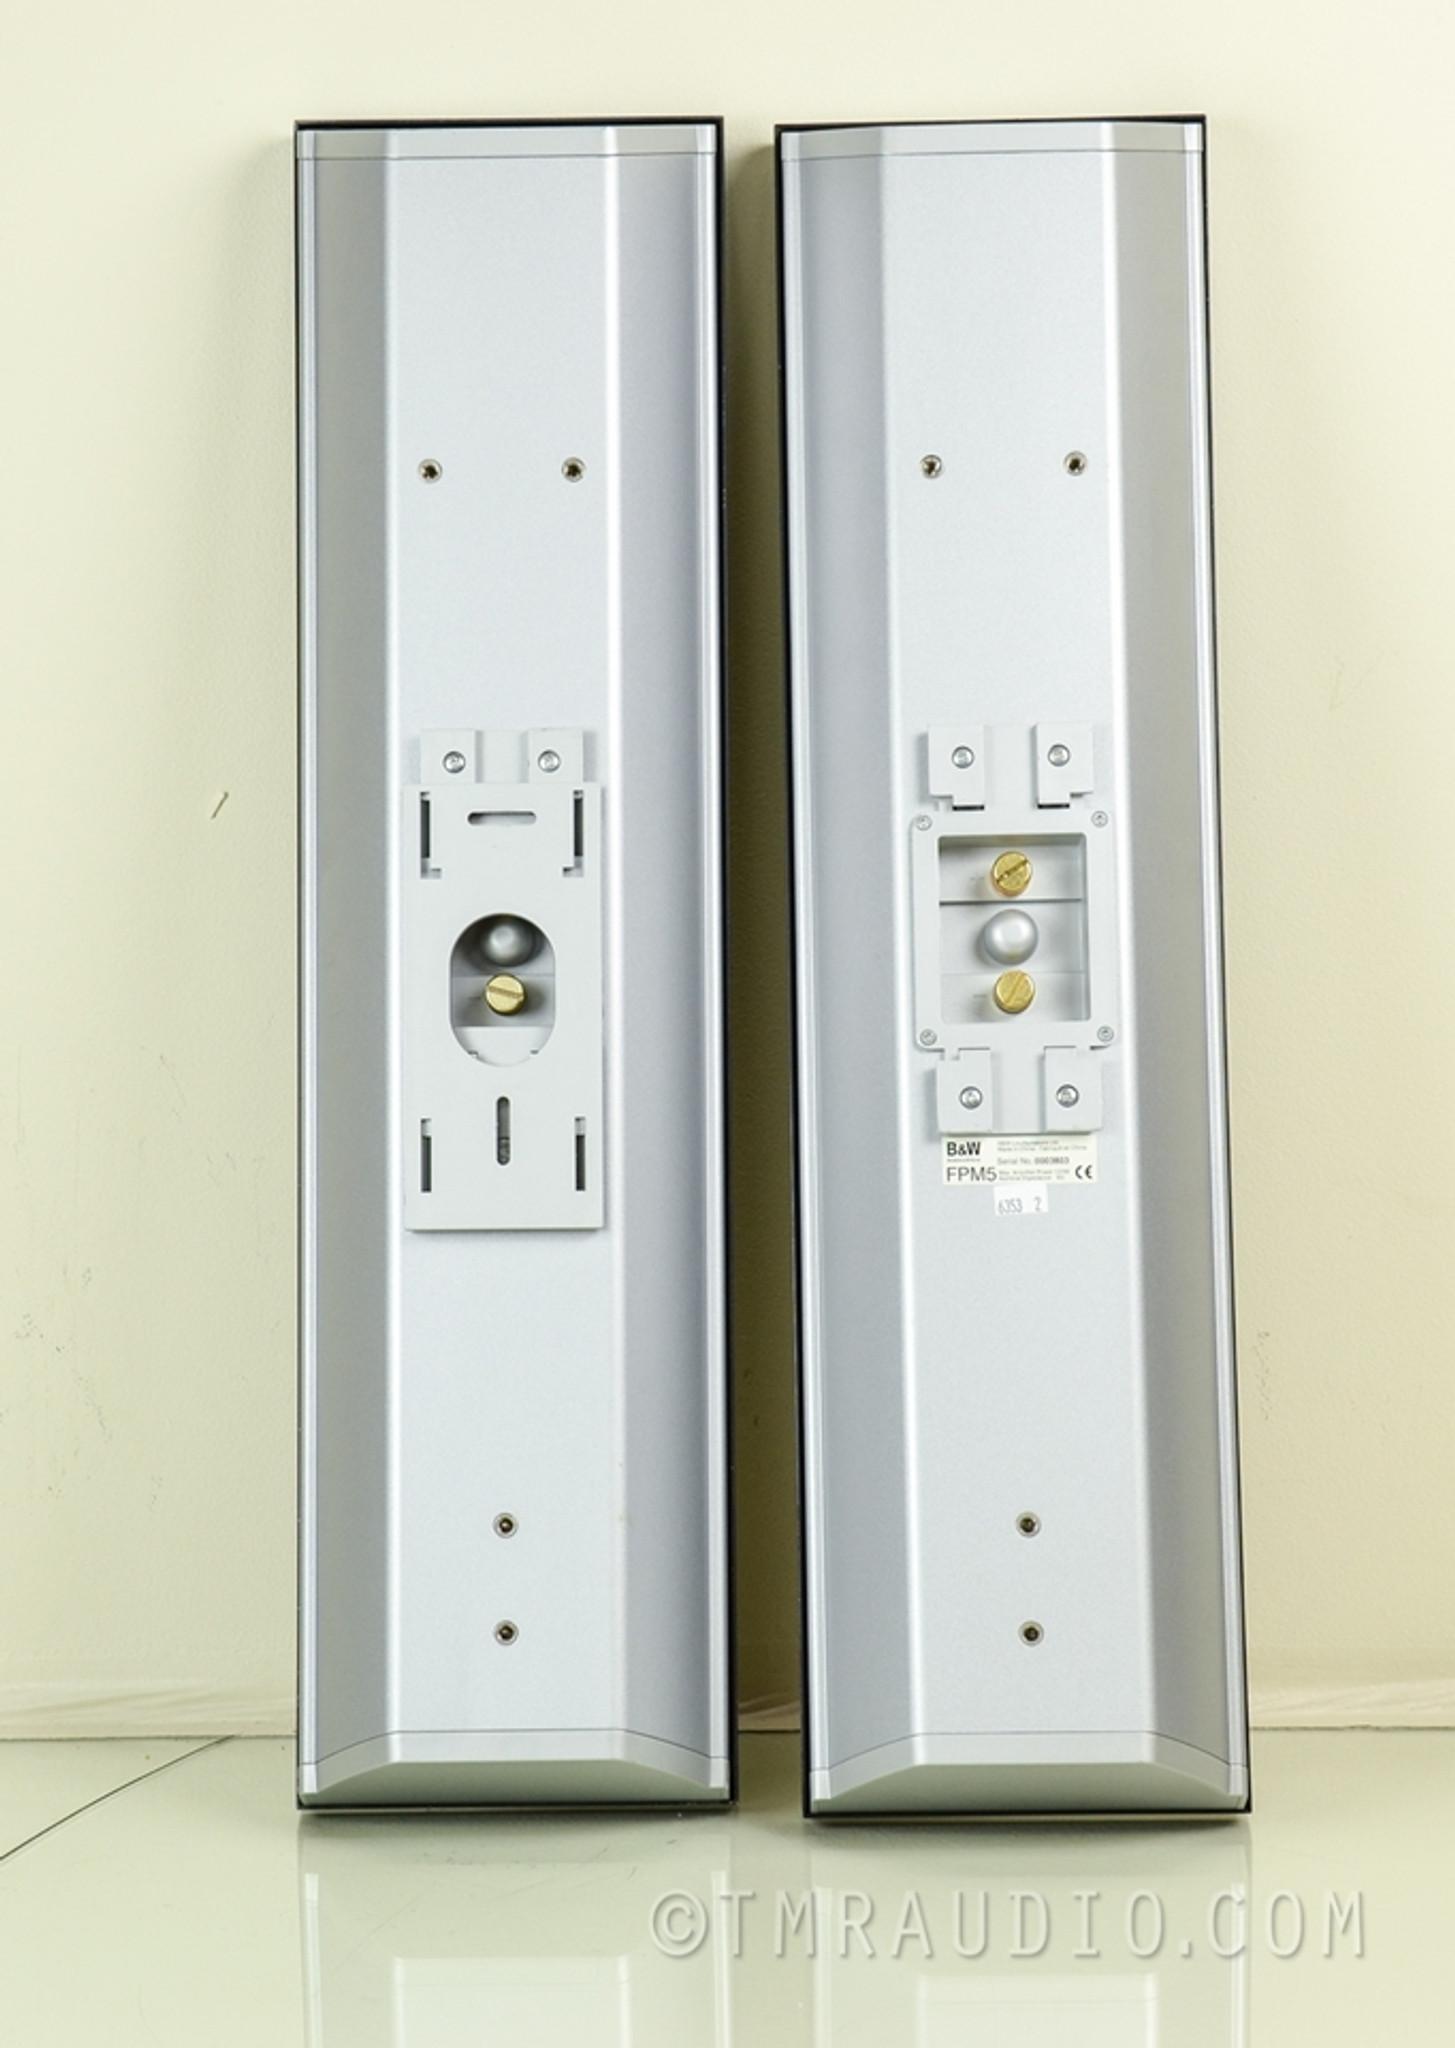 B Amp W Fpm5 Flat Panel Audiophile Speakers Bowers Amp Wilkins